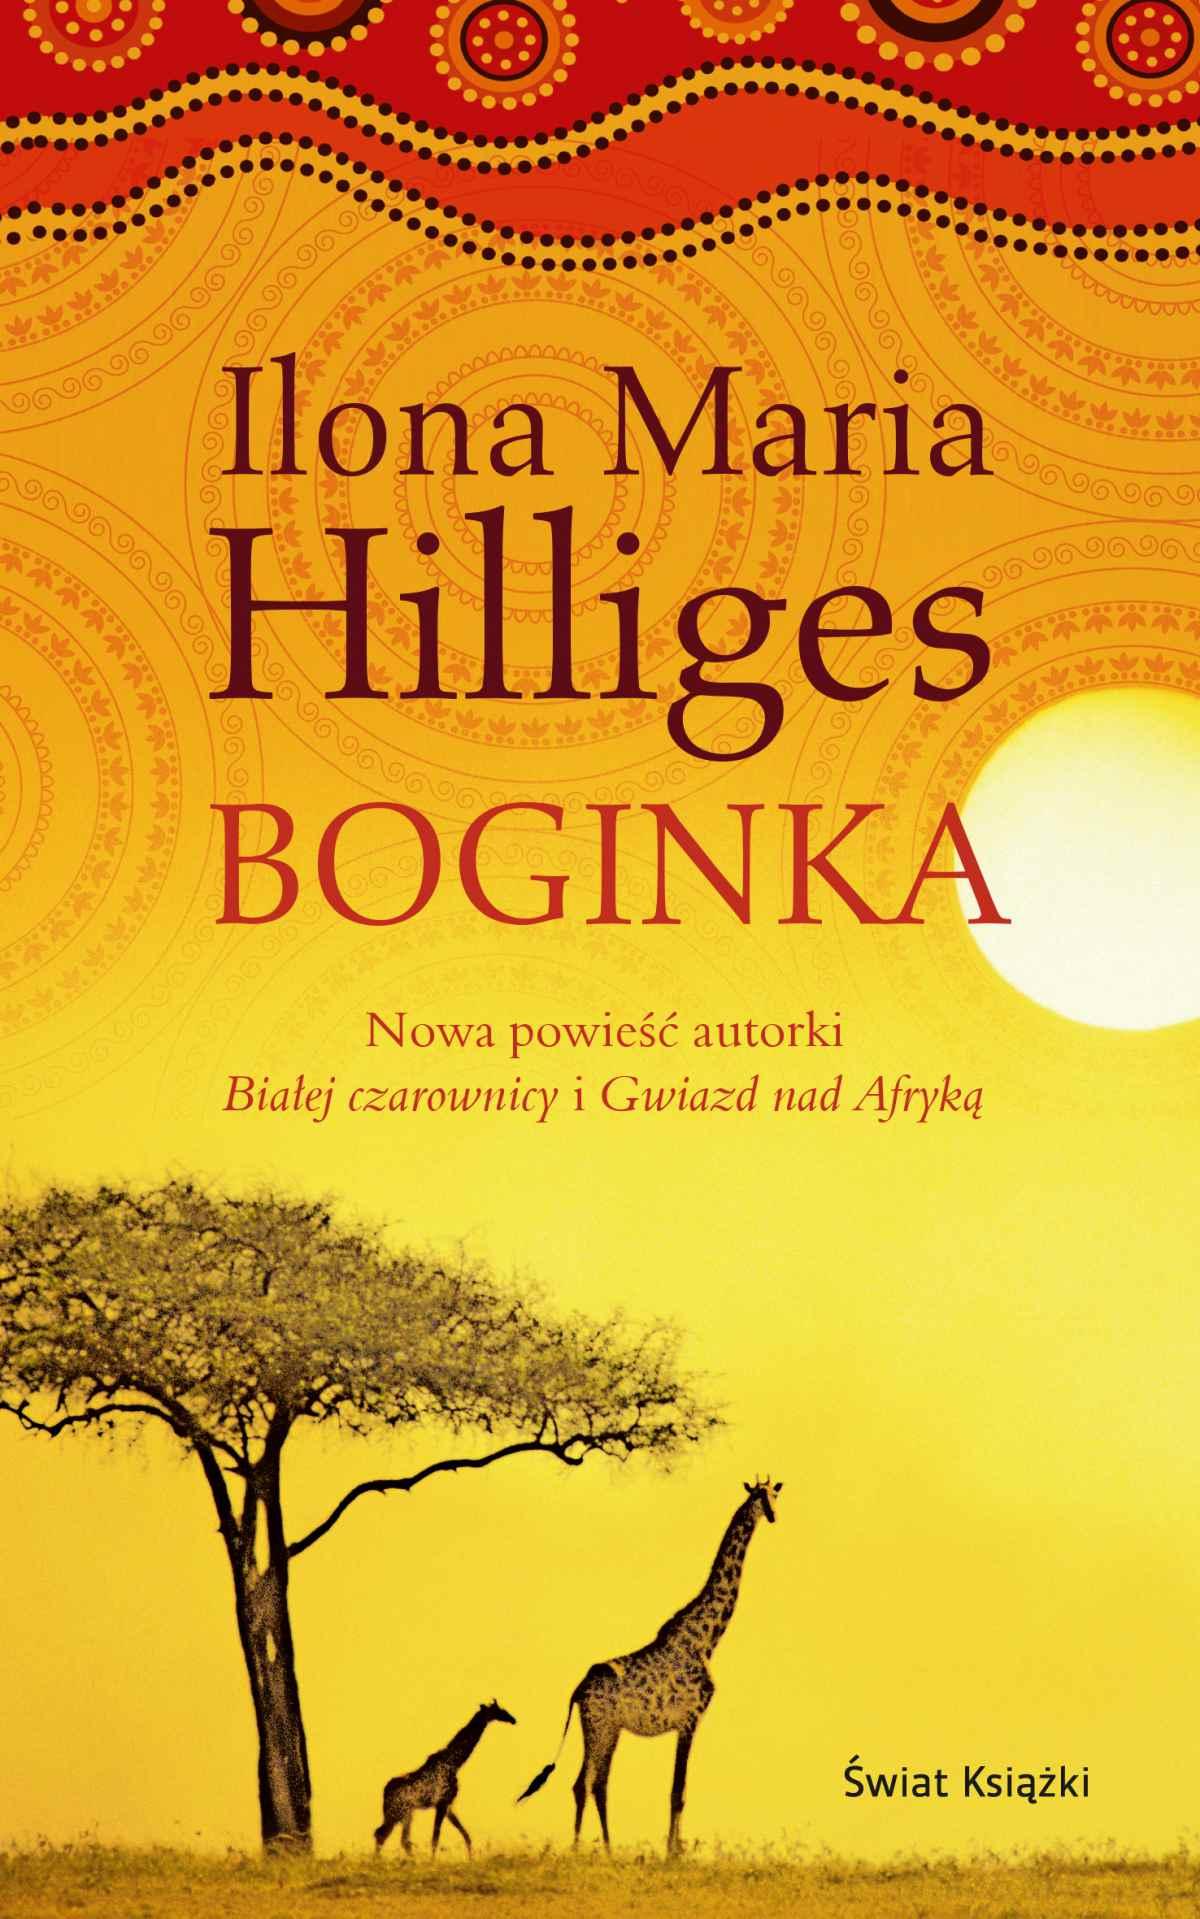 Boginka - Ebook (Książka na Kindle) do pobrania w formacie MOBI